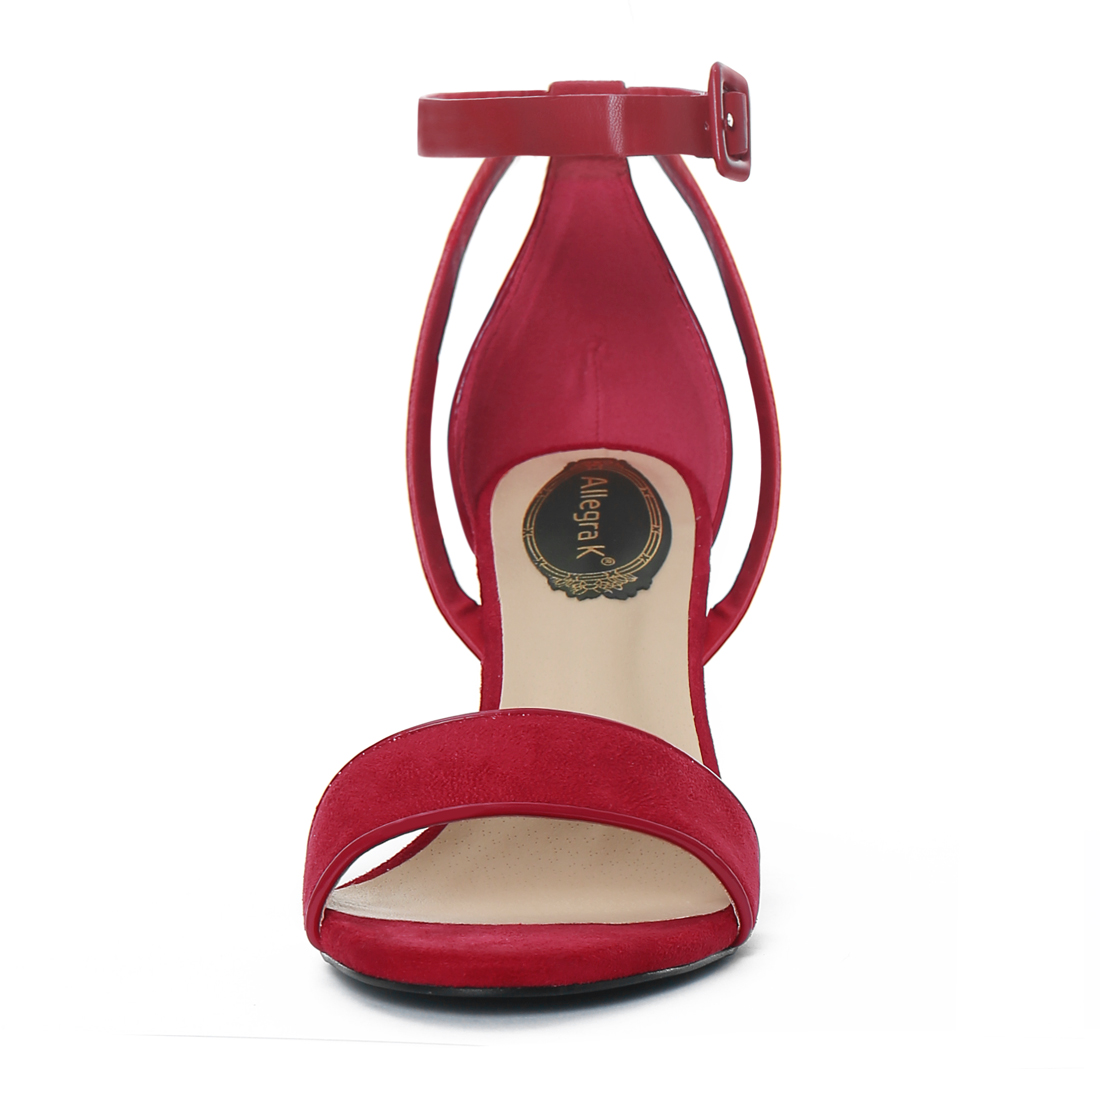 Womens sandals walmart - Unique Bargains Women S Pu Panel Chunky Heel Ankle Strap Piped Sandals Walmart Com